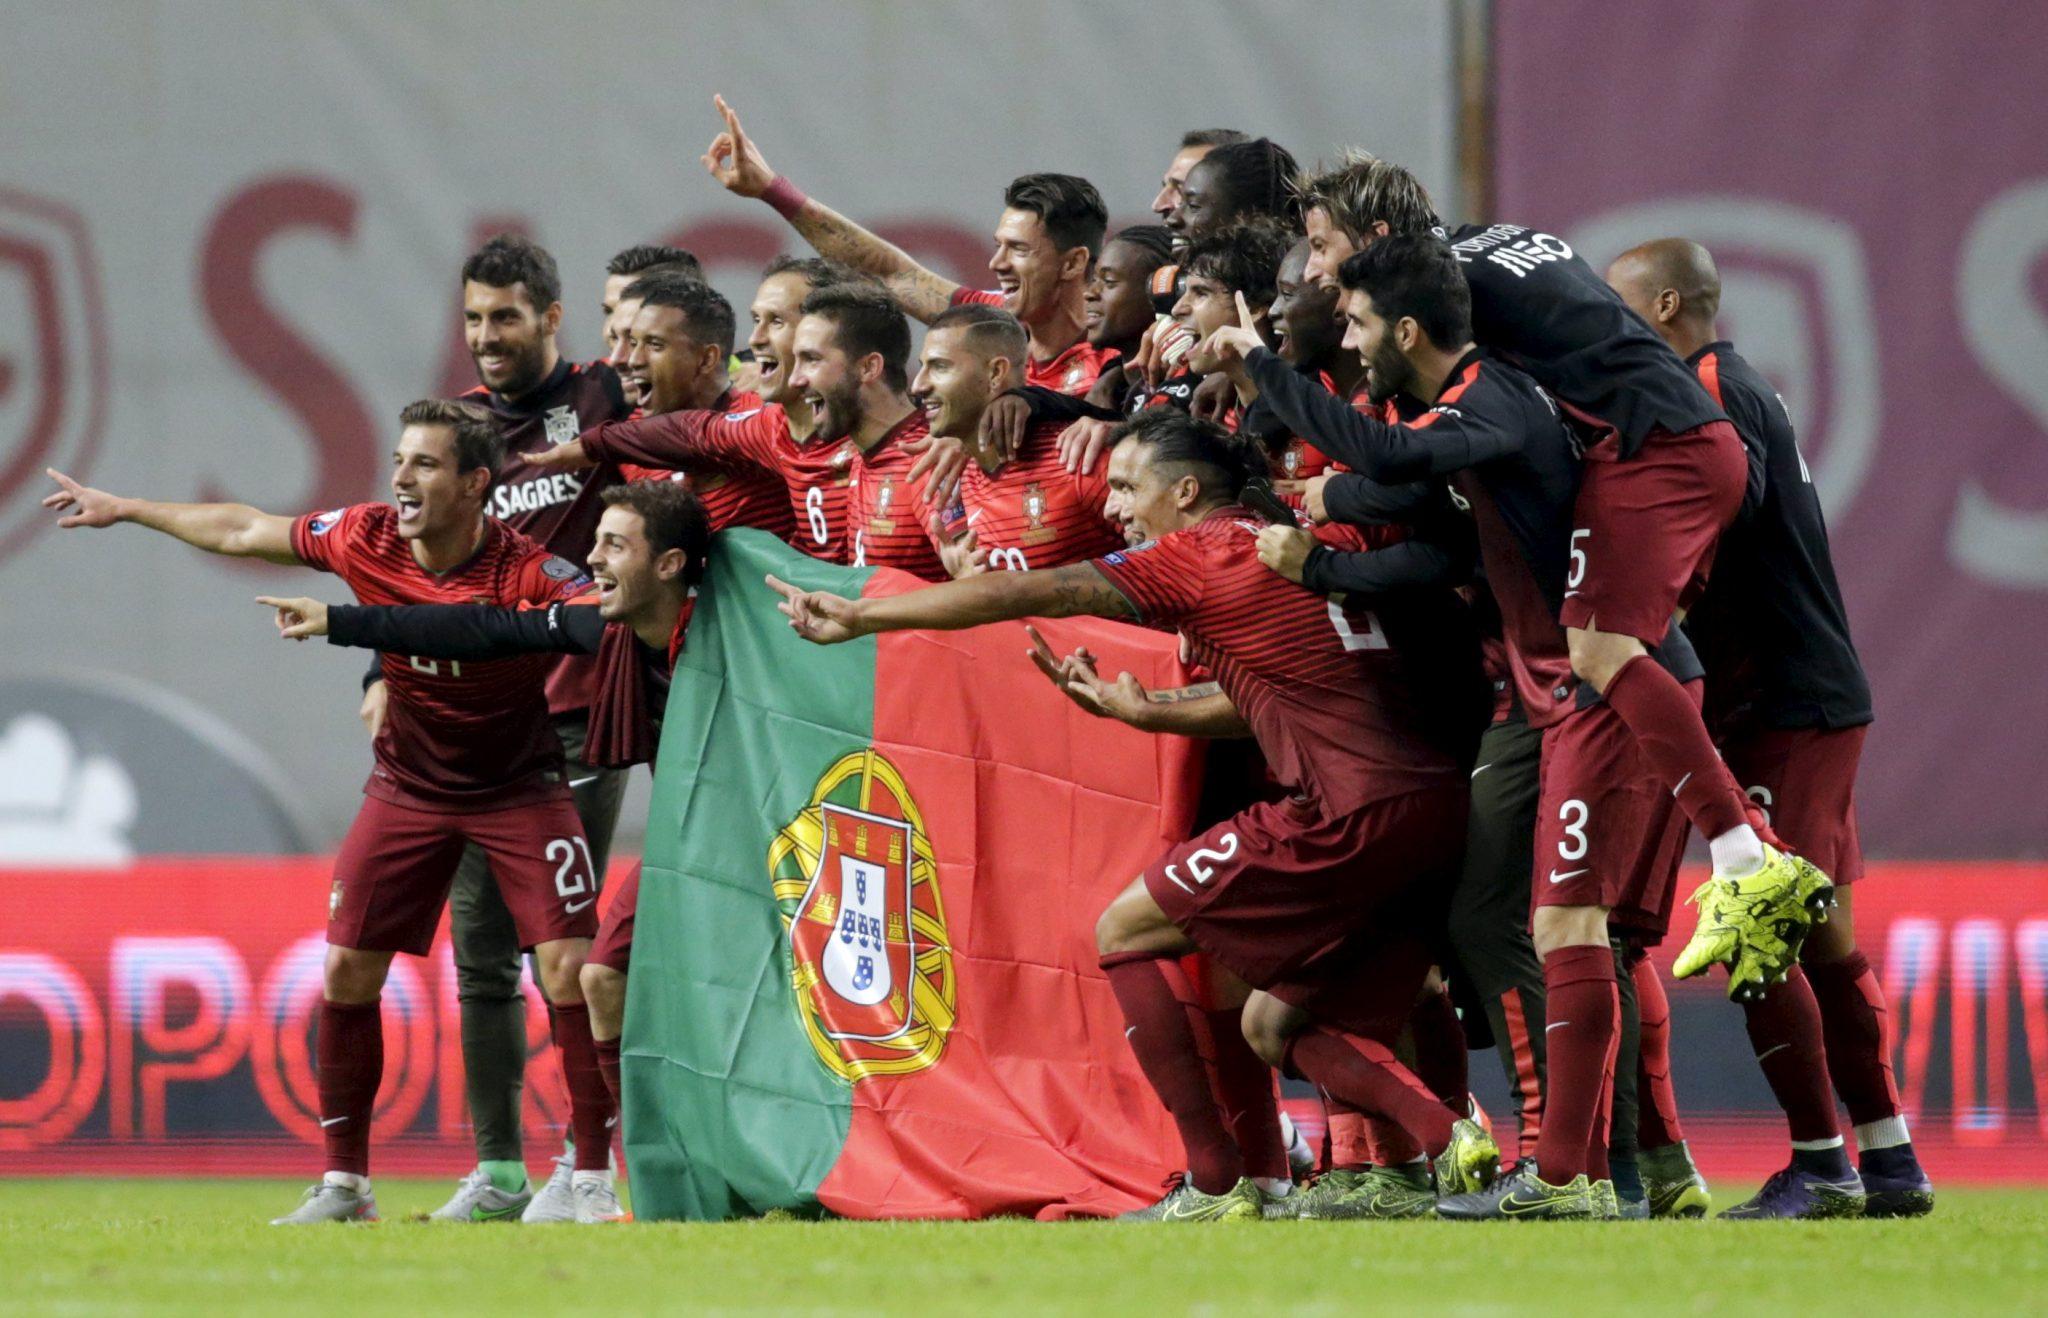 تیم ملی پرتگال - پیشنهاد جالب یک متخصص جنسی به بازیکنان تیم ملی پرتگال: خودارضایی کنید!!